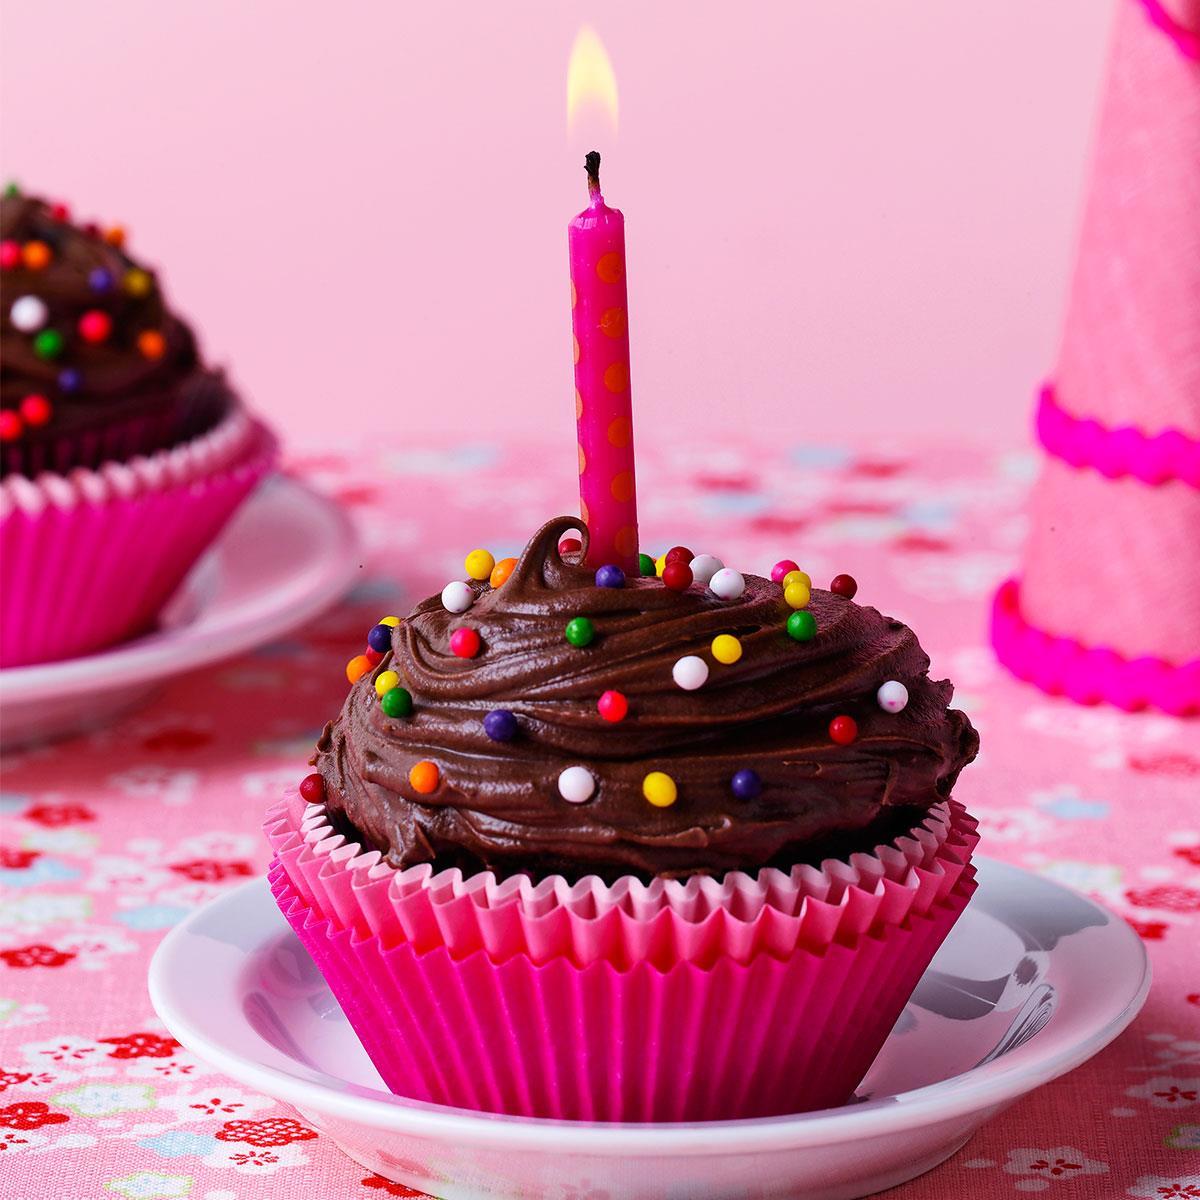 A Cupcake Candy Birthday Cake